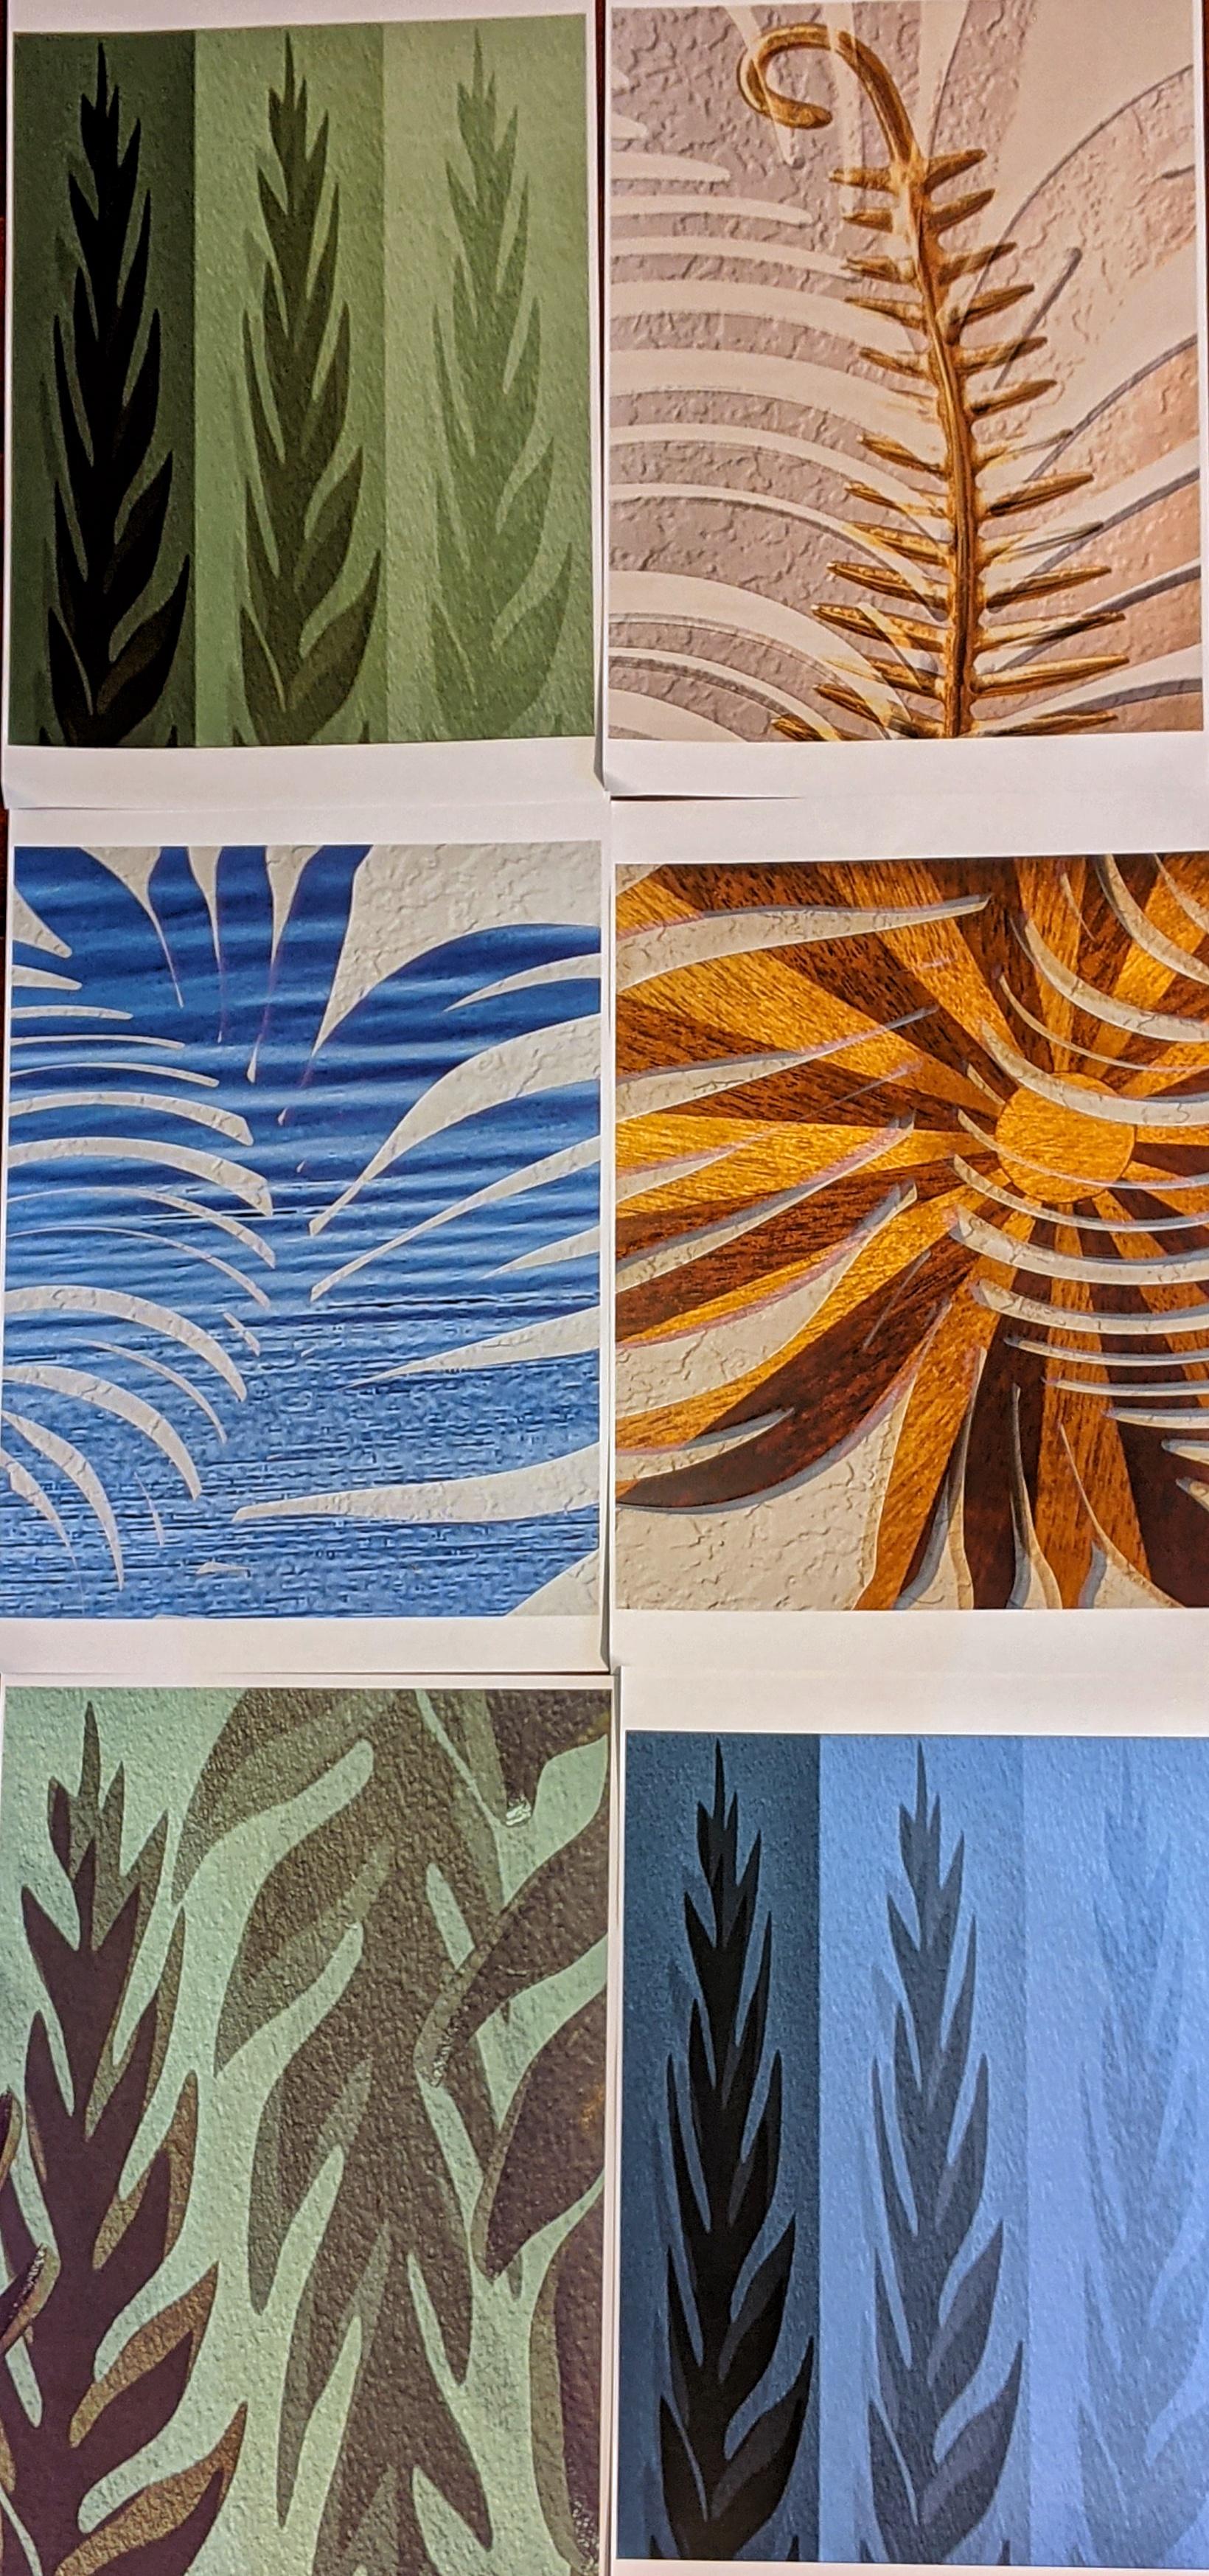 Frond Memories – Evolution of an Art Panel